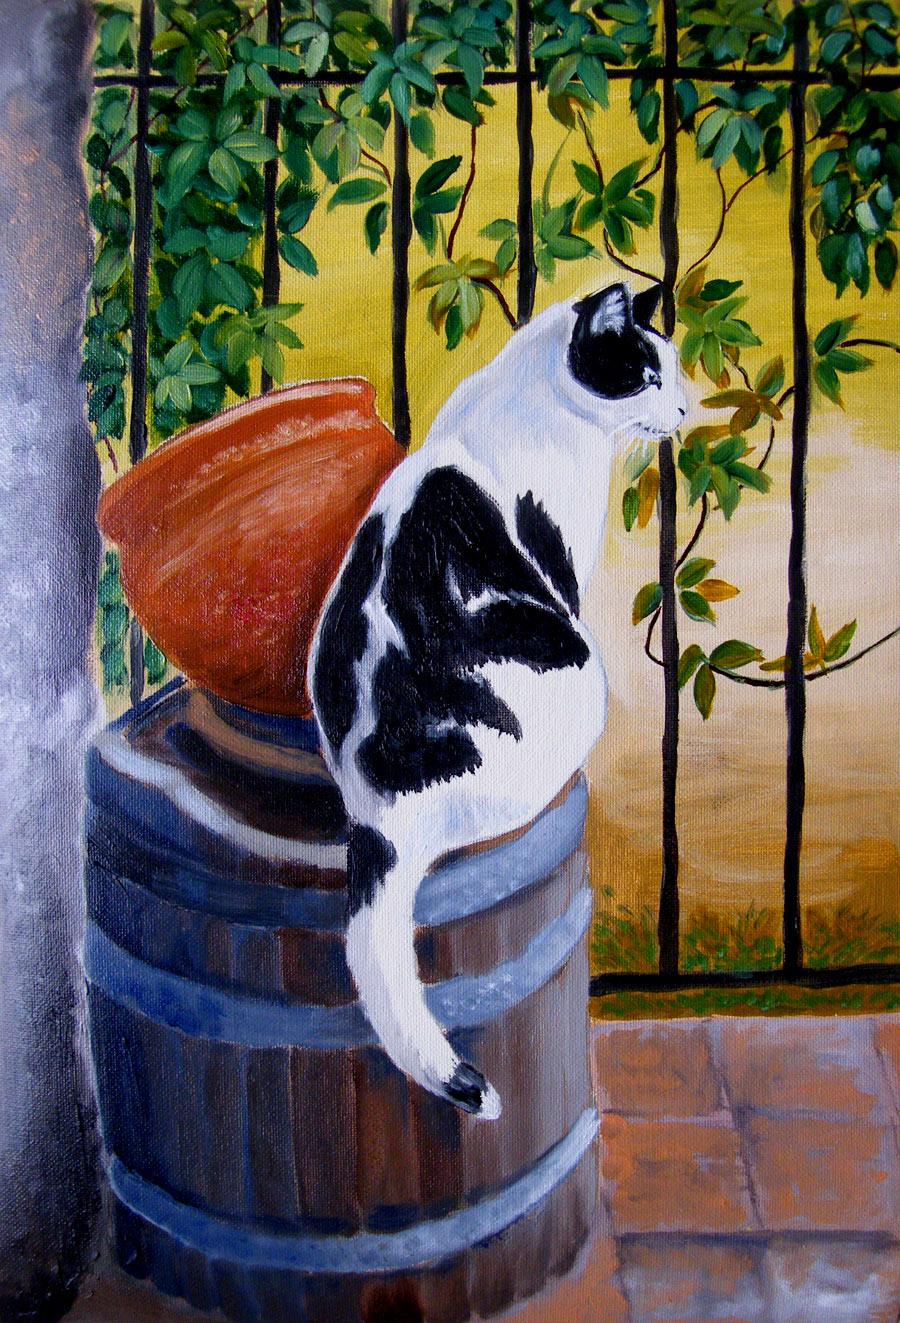 Patryk - obraz olejny Malgorzata Jaskłowska